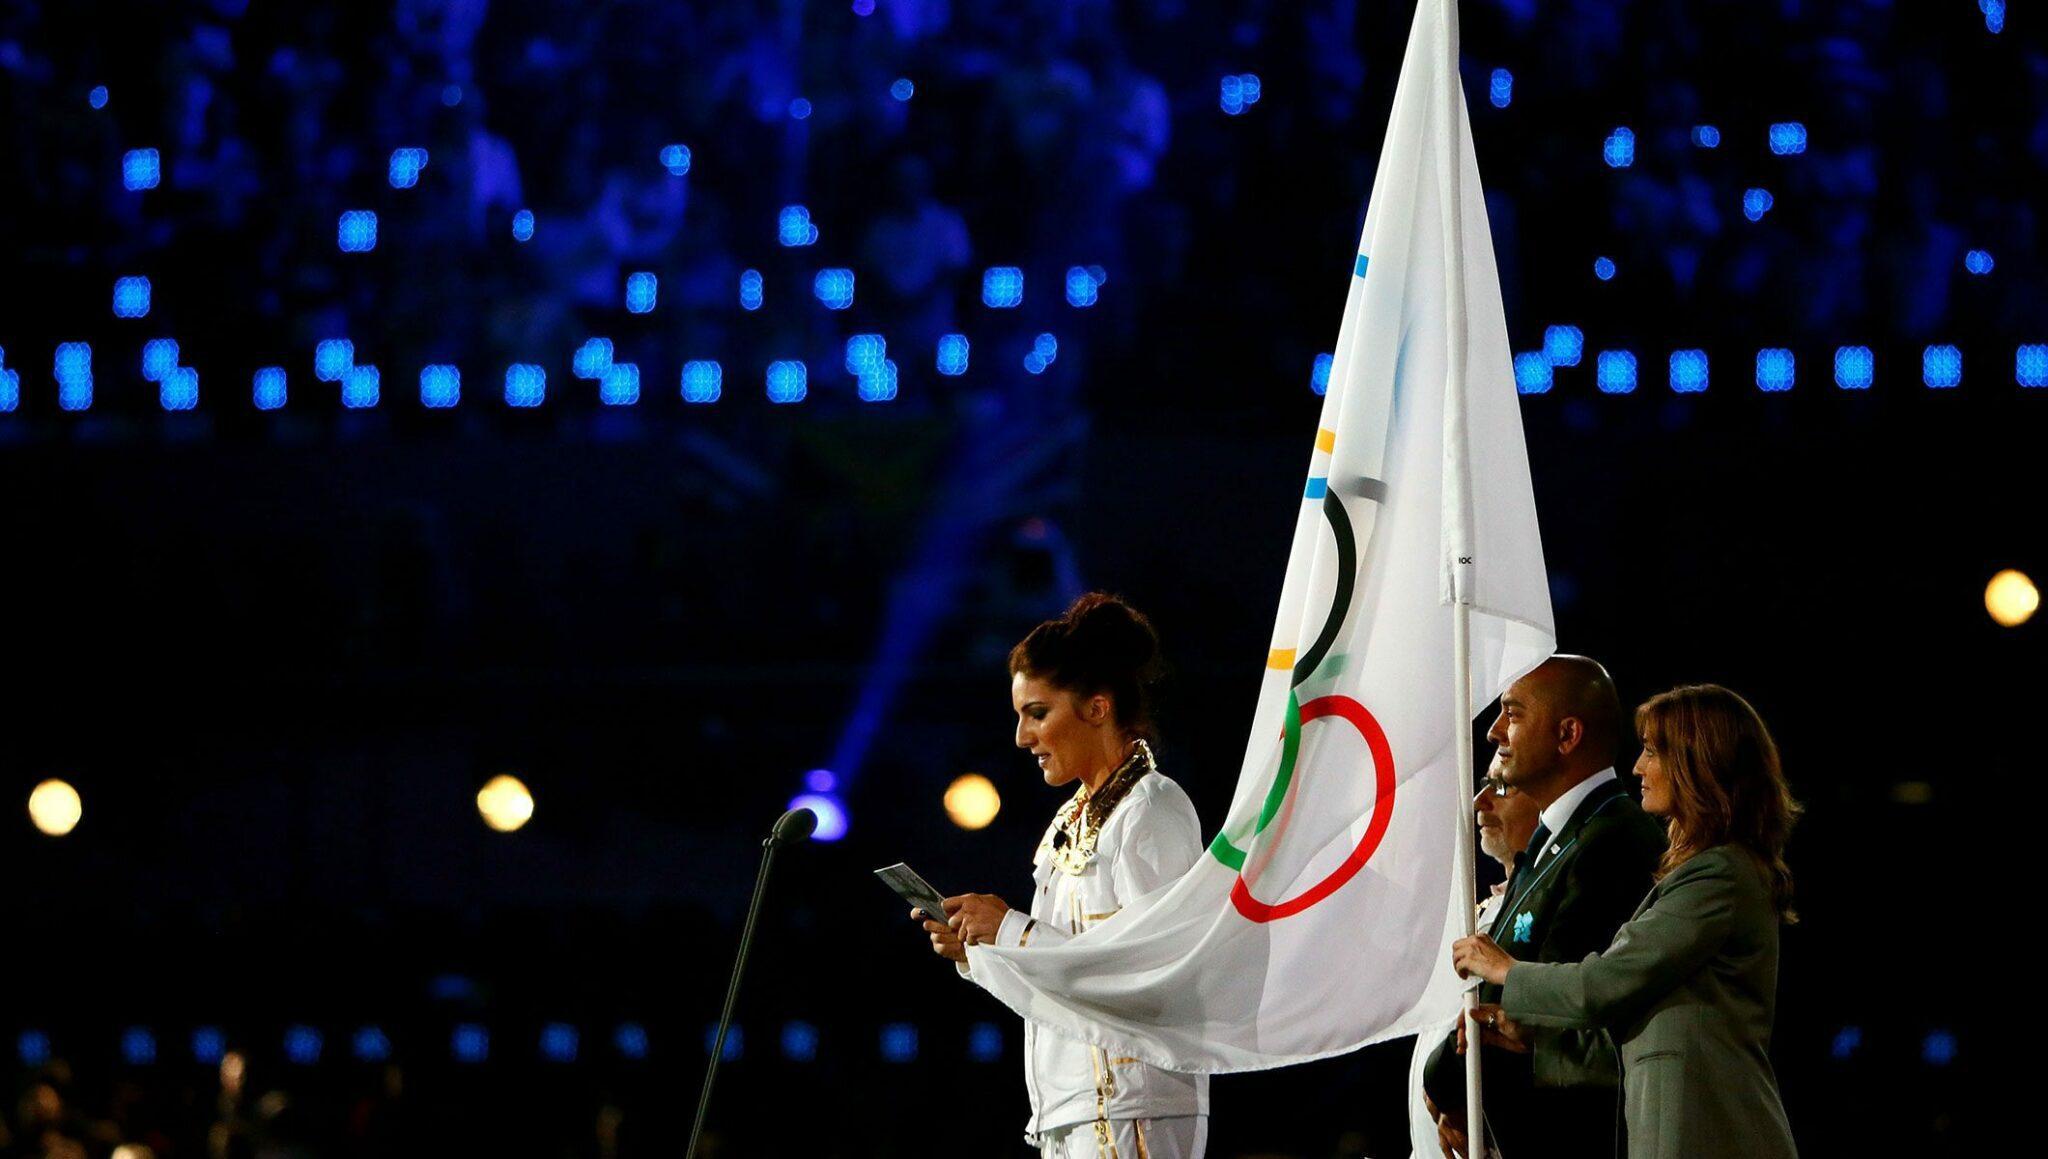 Serment olympique